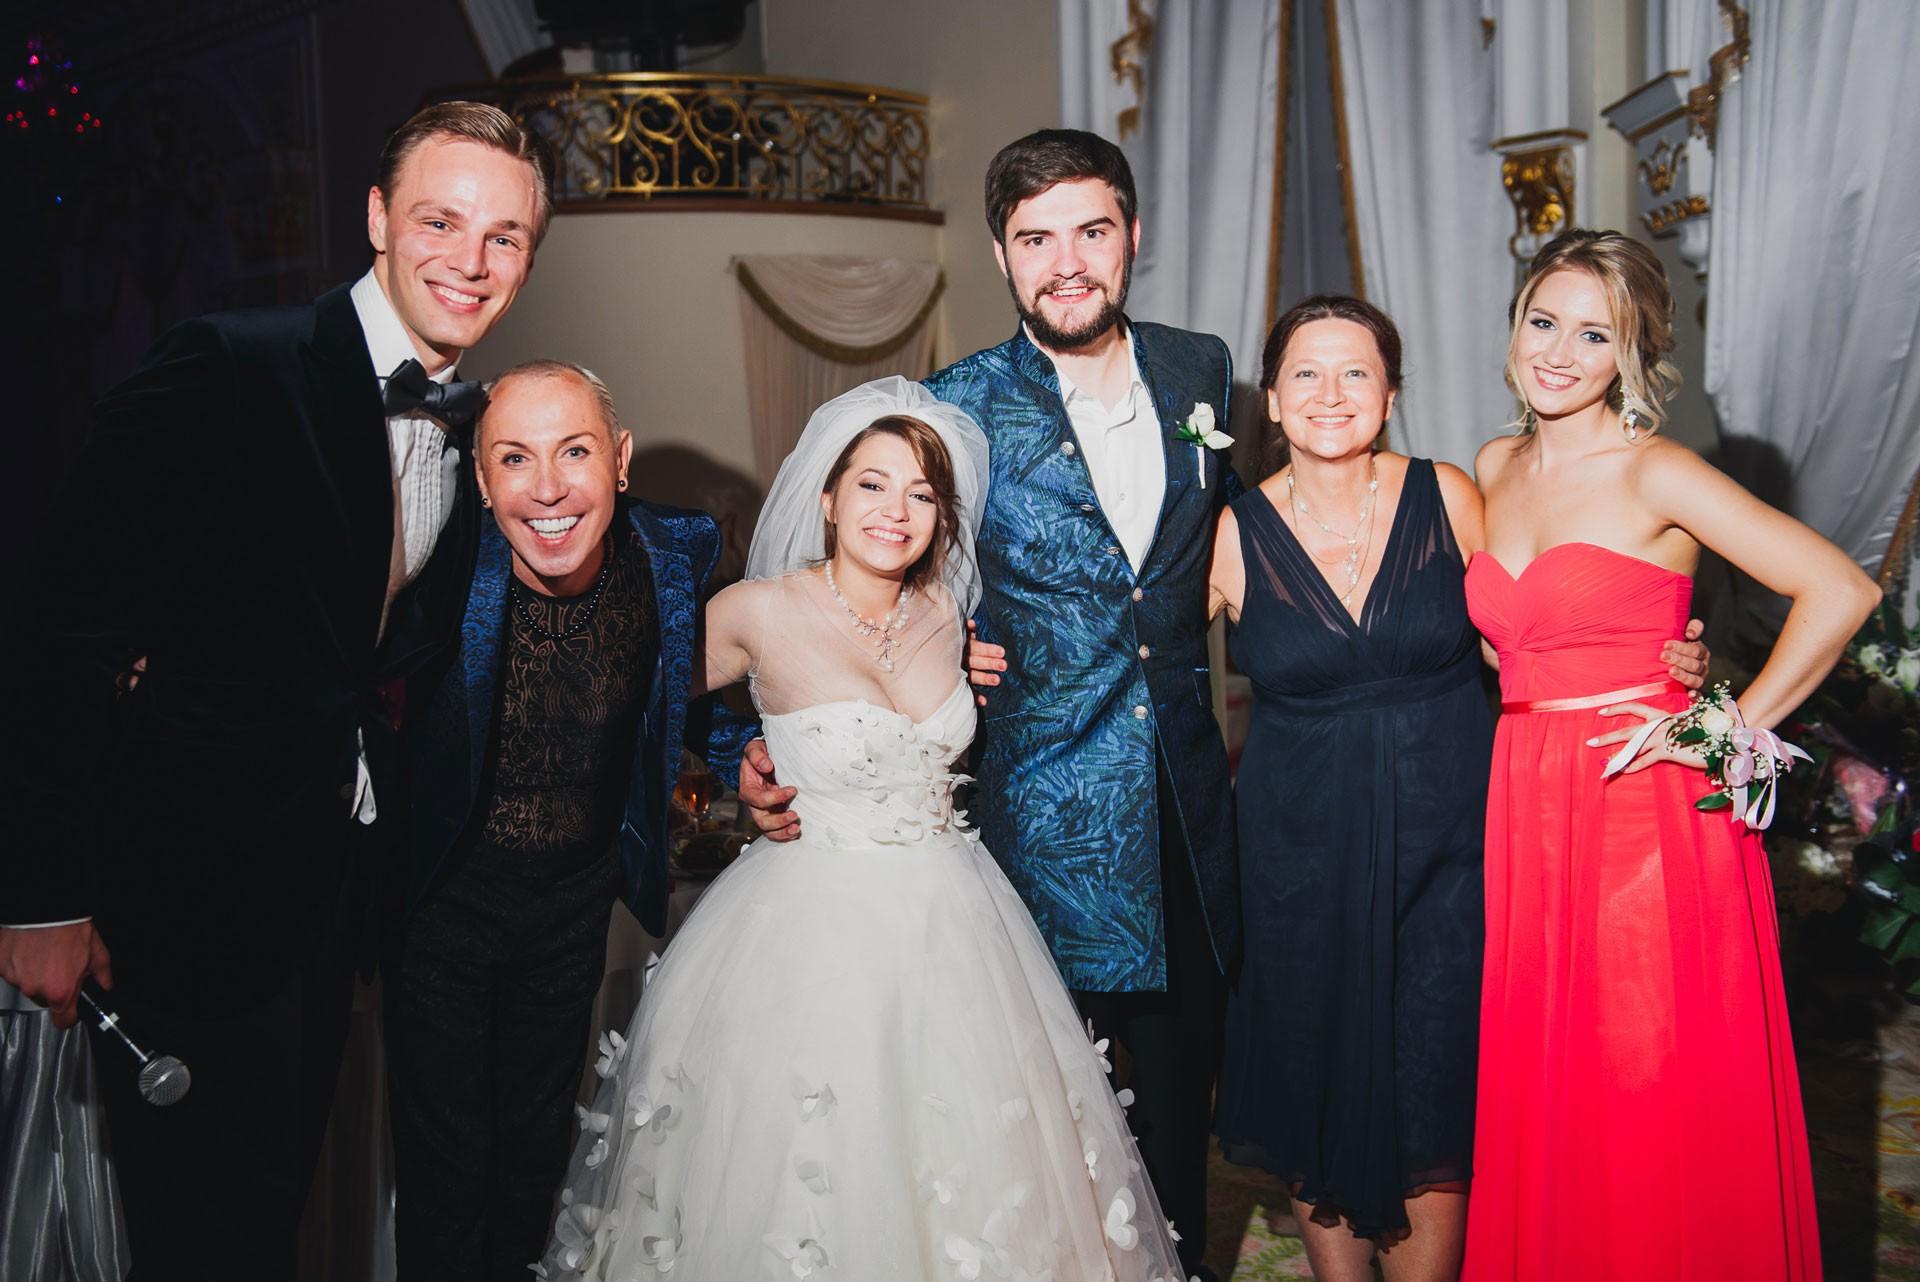 Свадьба Ксении Сябитовой и Андрея Снеткова фото 13